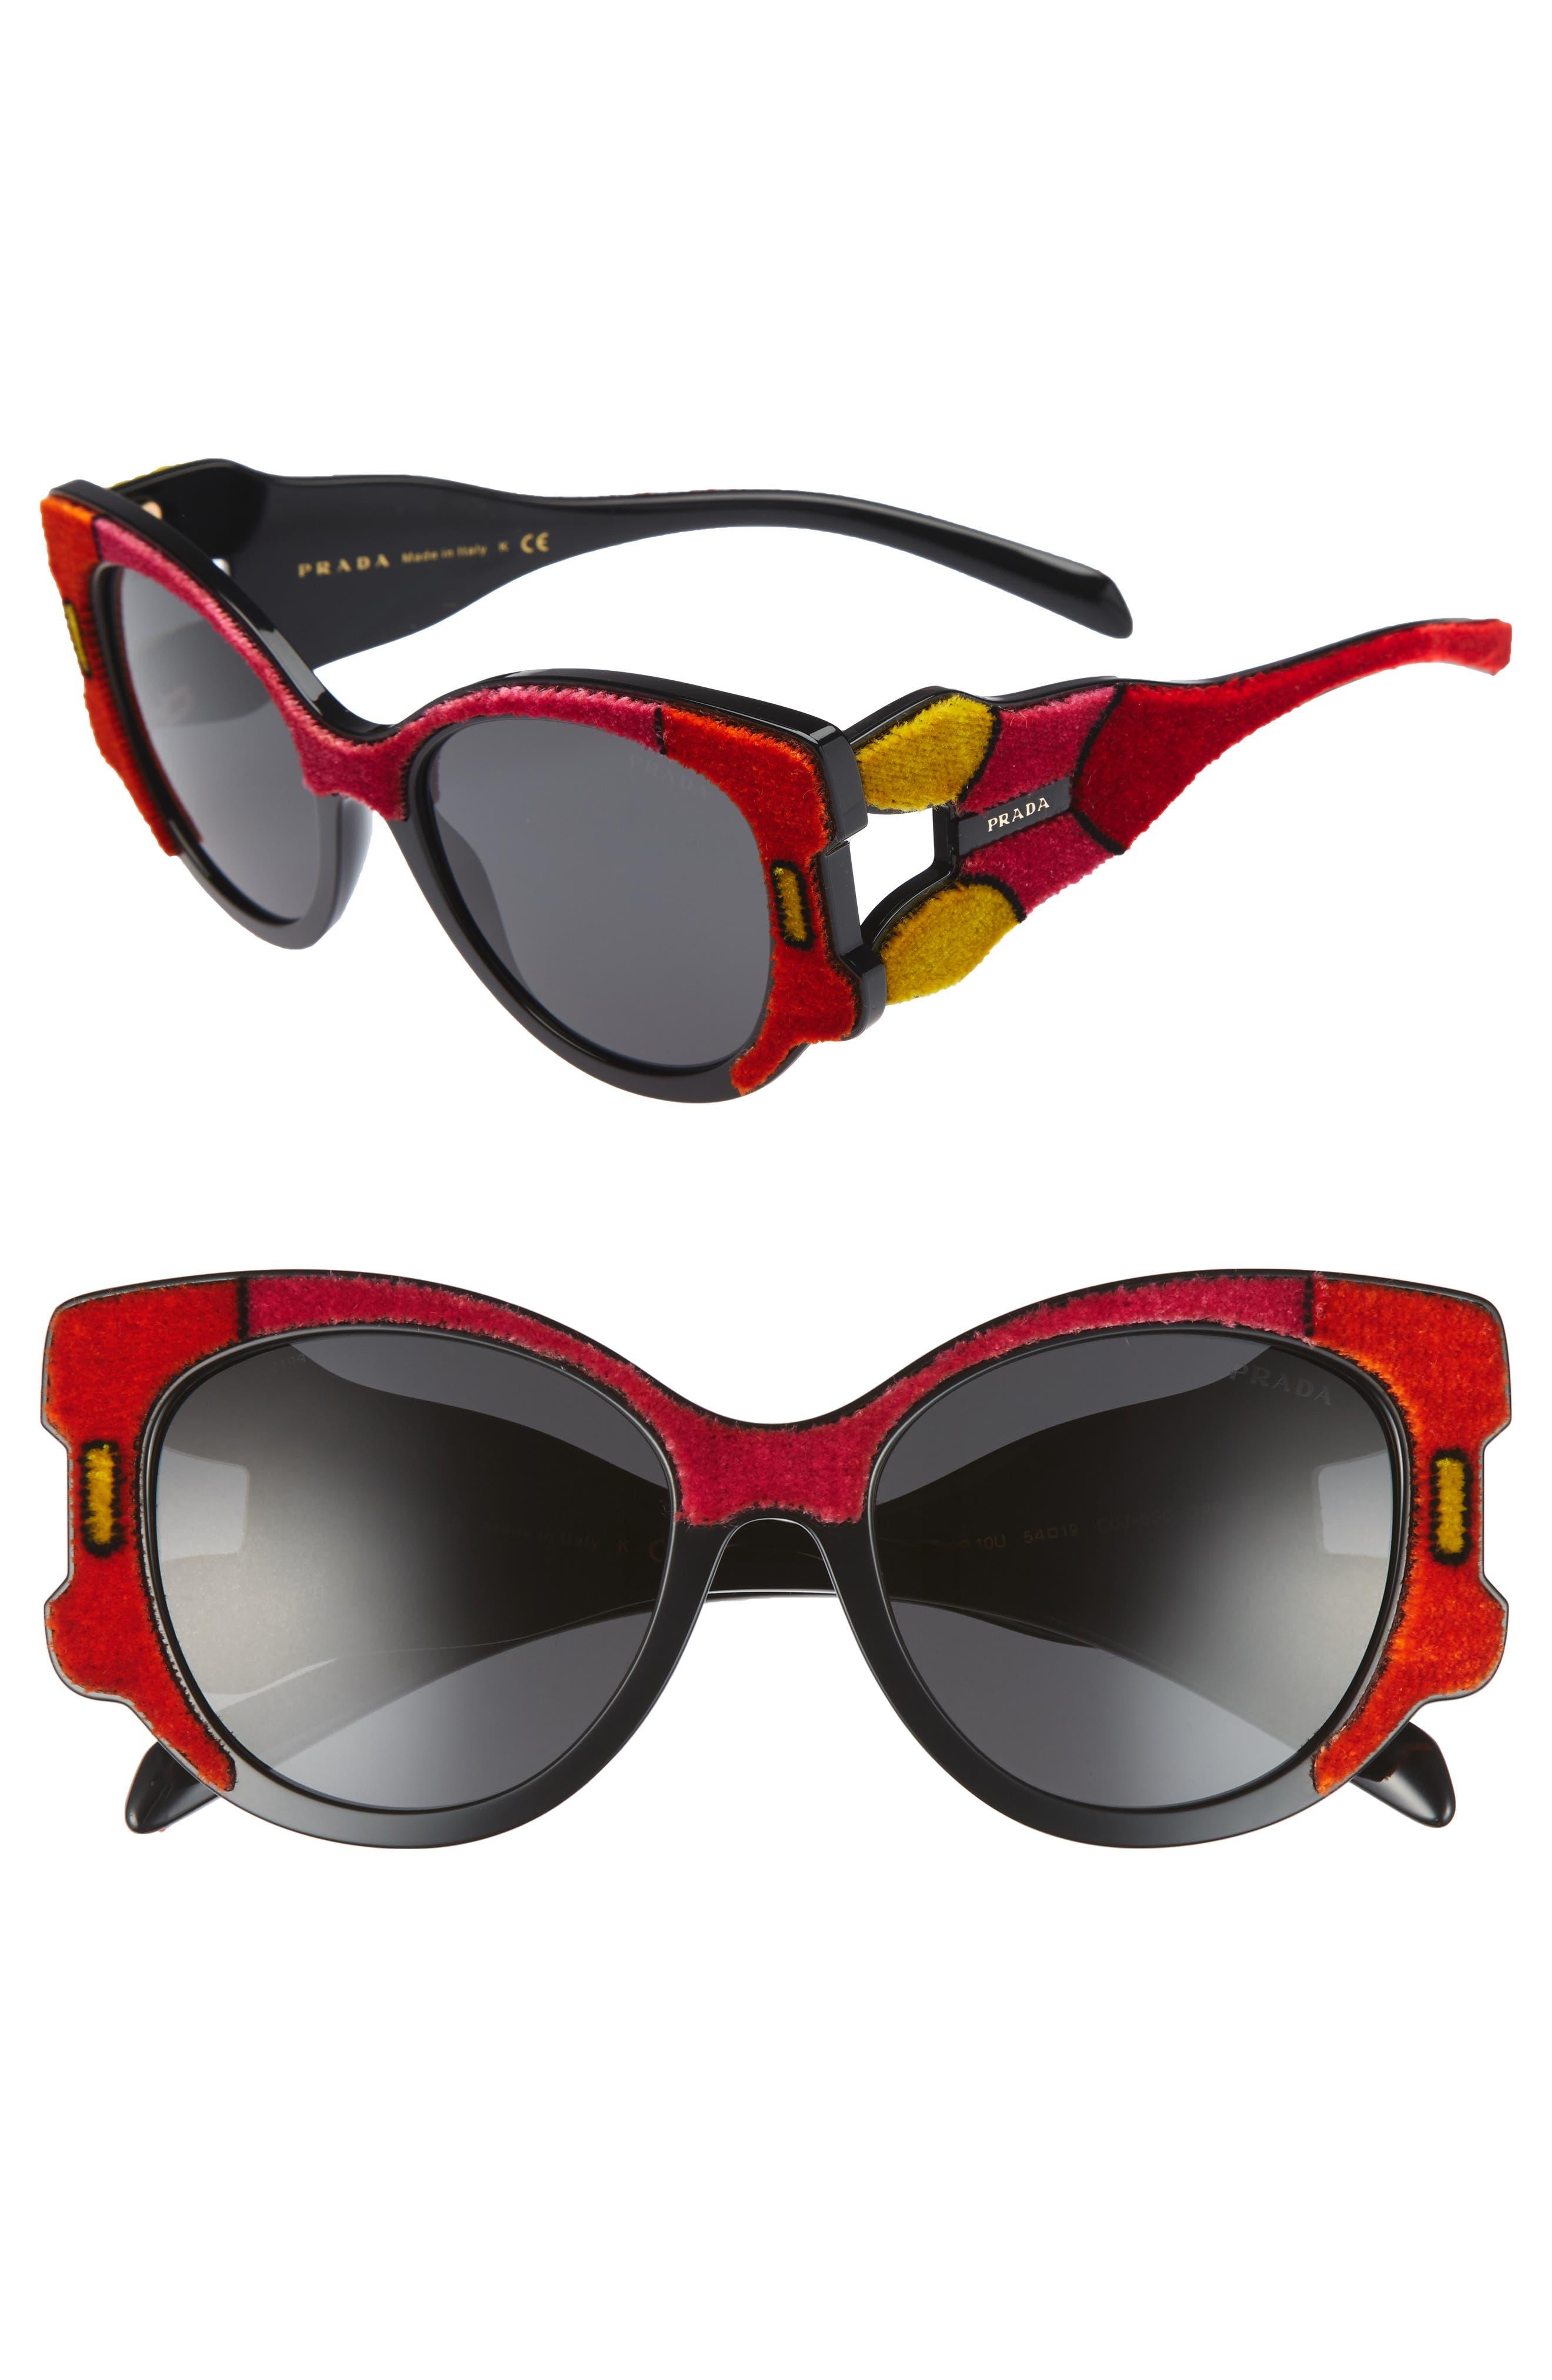 54mm Colorblock Round Sunglasses,                         Main,                         color, 010